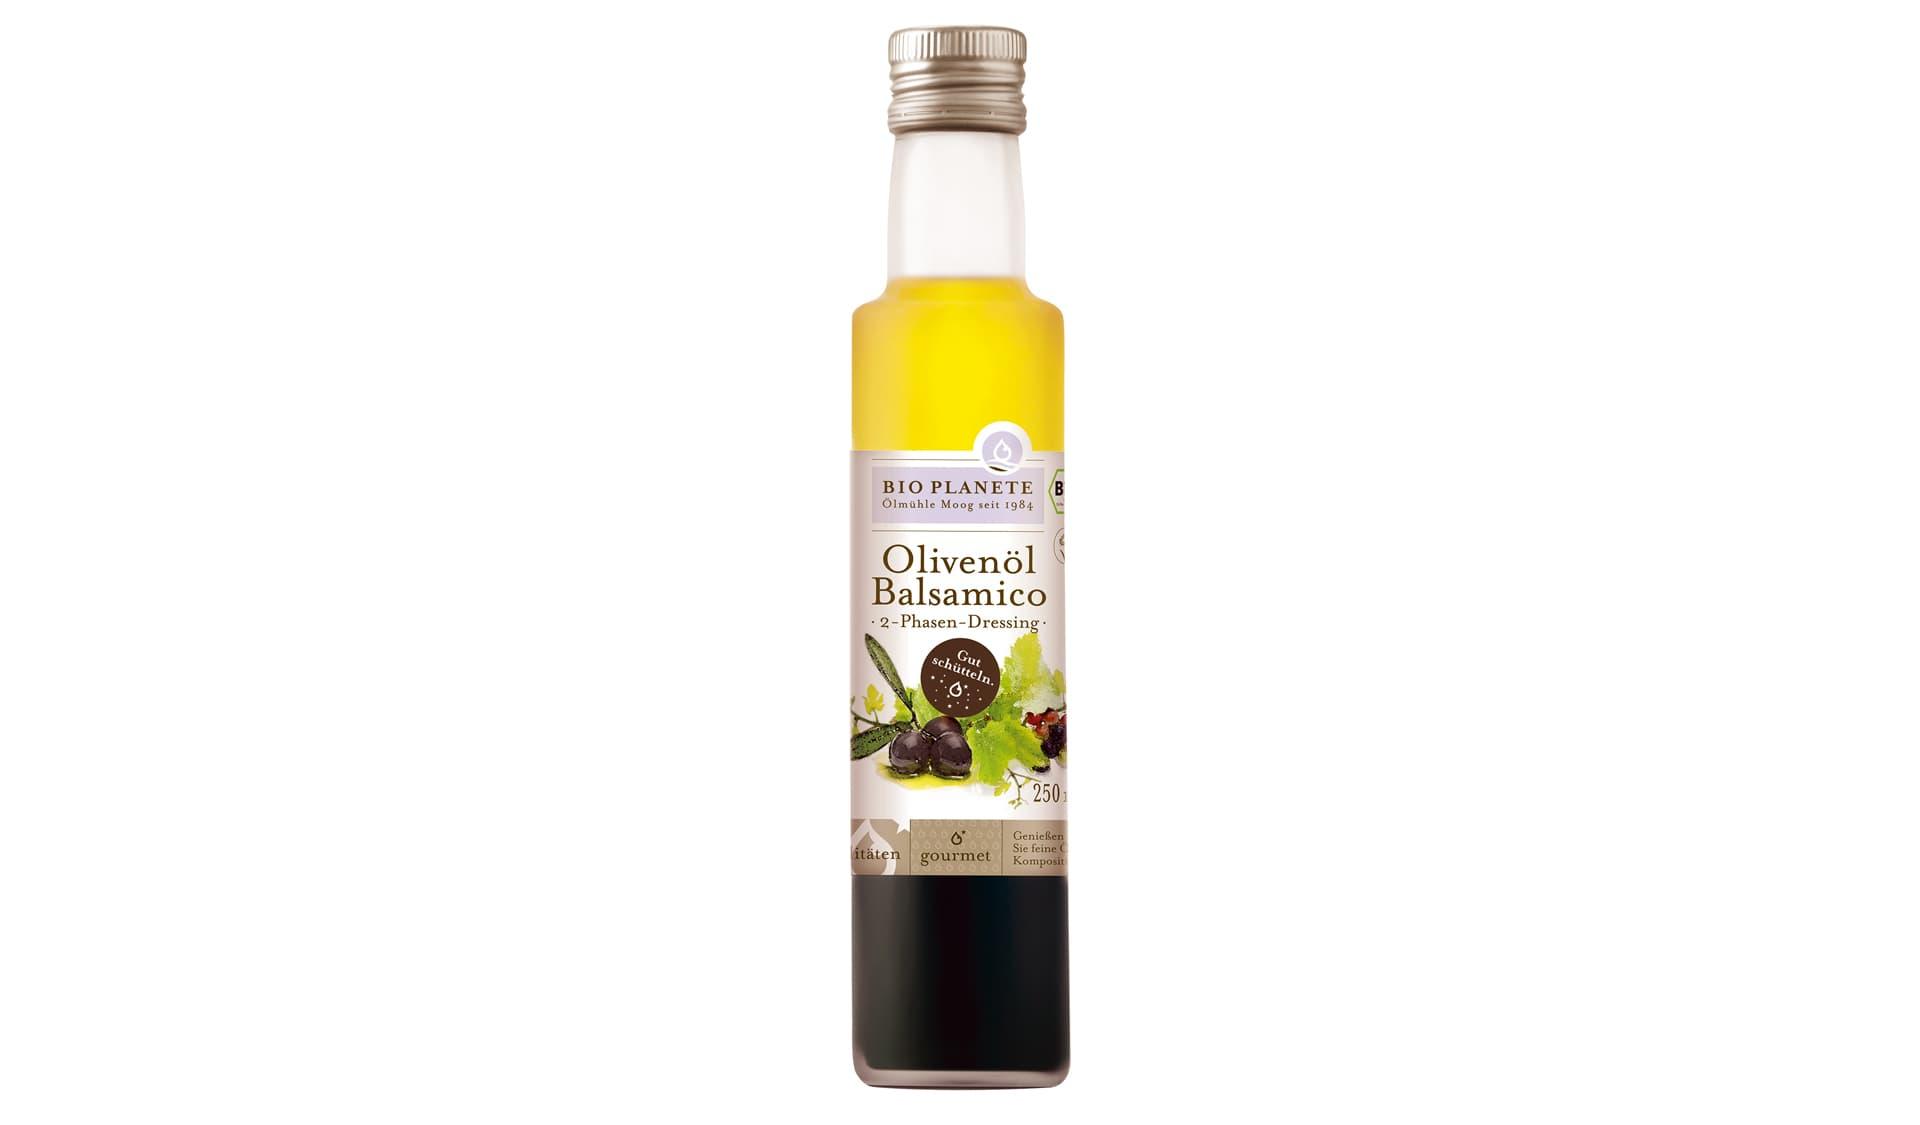 Bio Planète Olivenöl & Balsamico 2-Phasen Dressing (www.bioplanete.com)